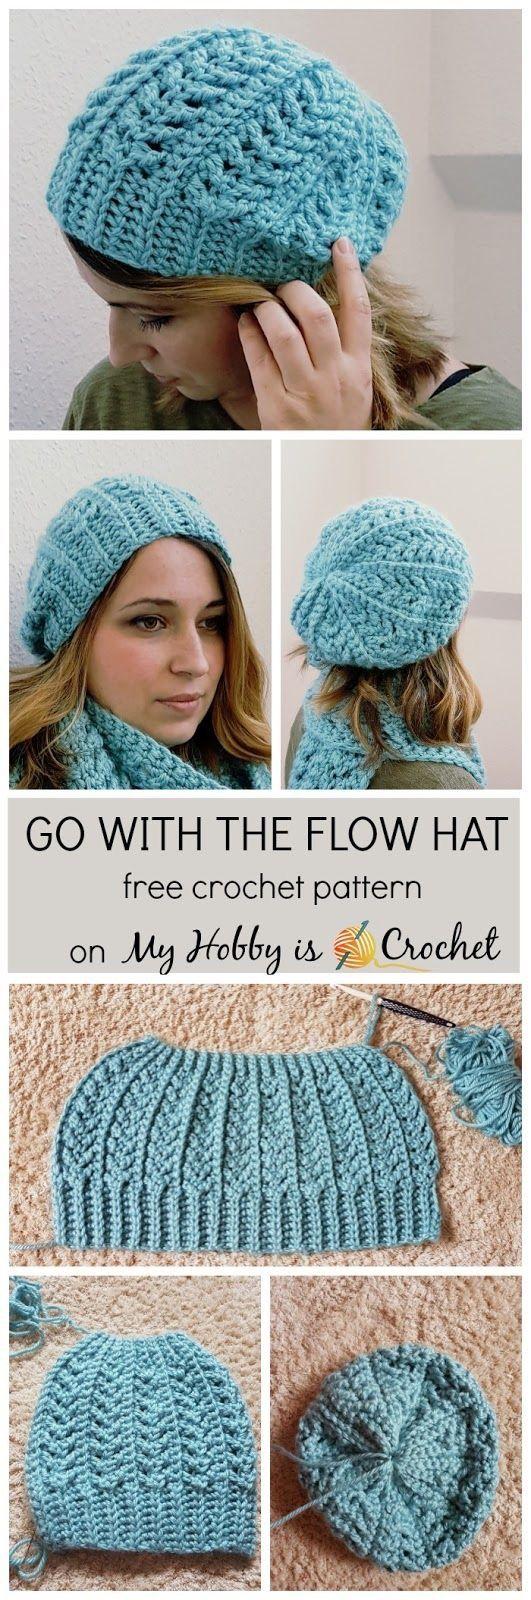 1113 best Hats, caps, headbands, bows images on Pinterest | Crochet ...